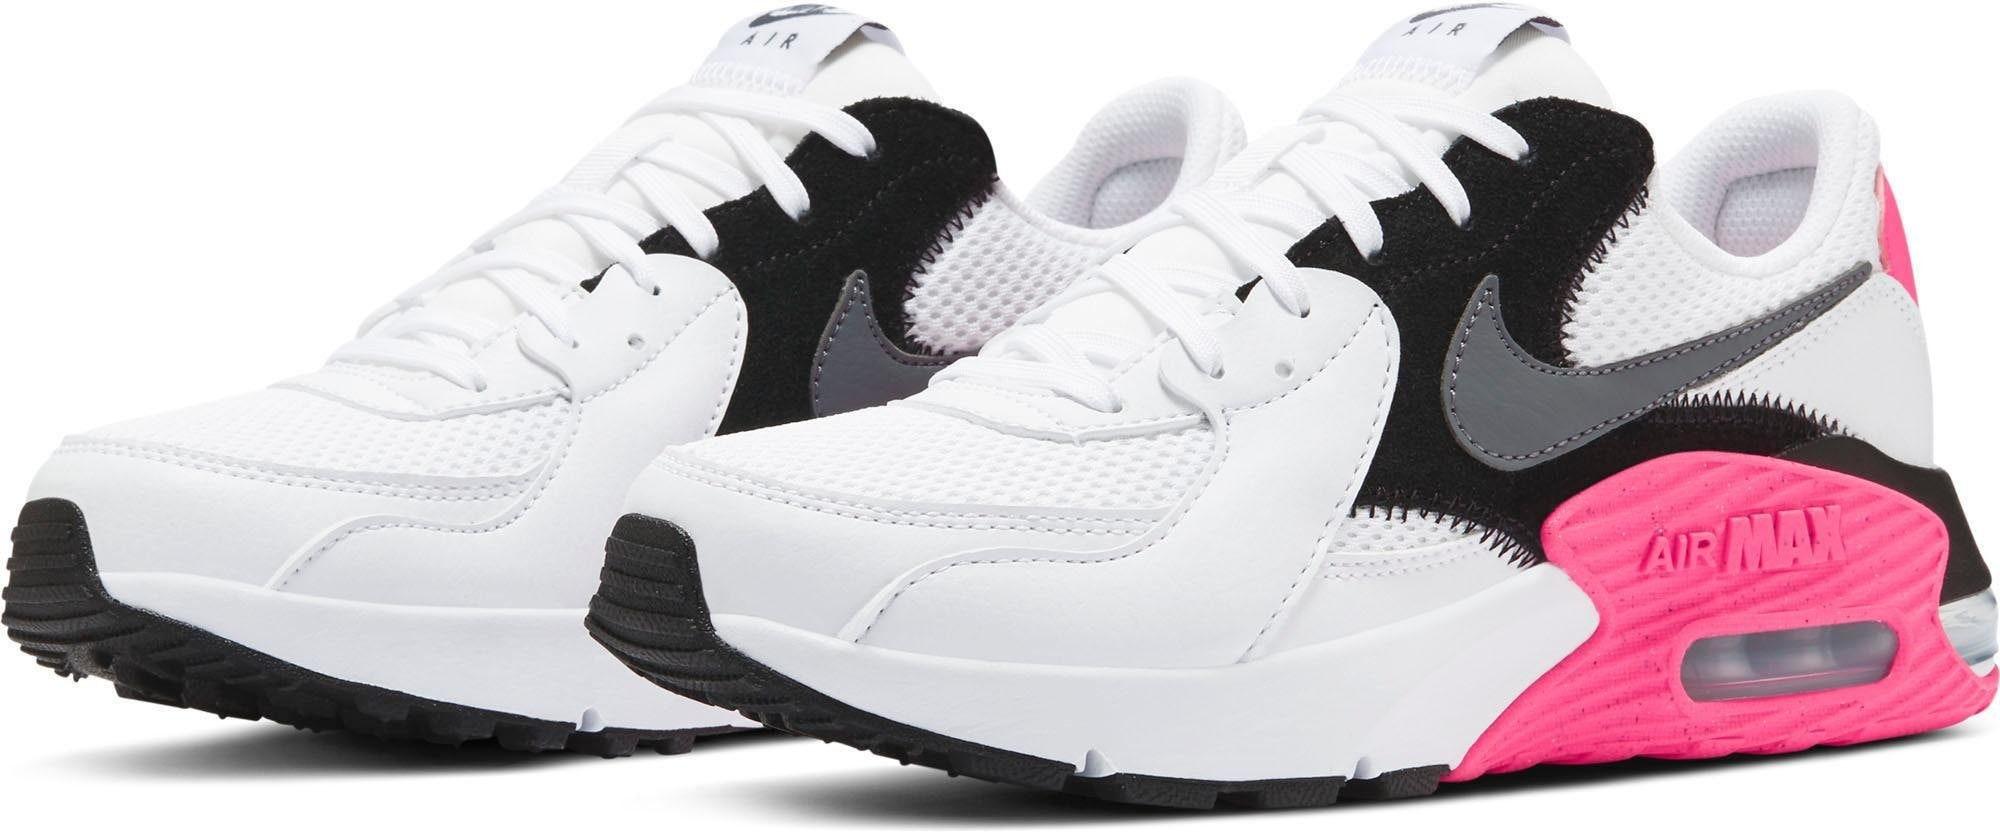 Nike Sportswear »Wmns Air Max Excee Air Max Day Pack« Sneaker